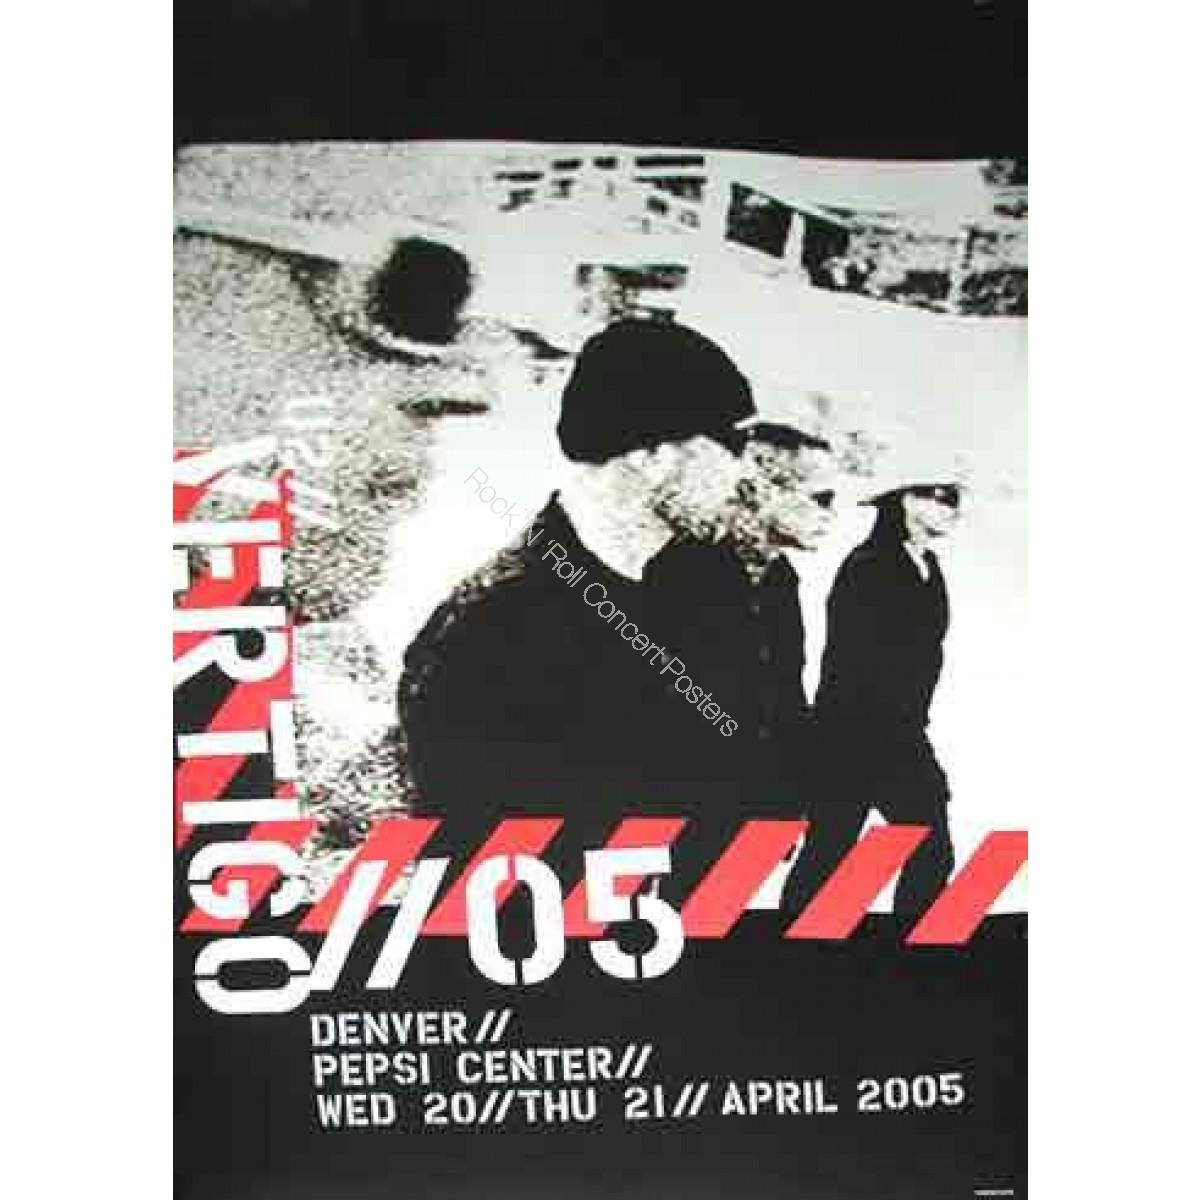 U2 @ The Pepsi Center Denver April 20th & 21st 2005 LE print of 100